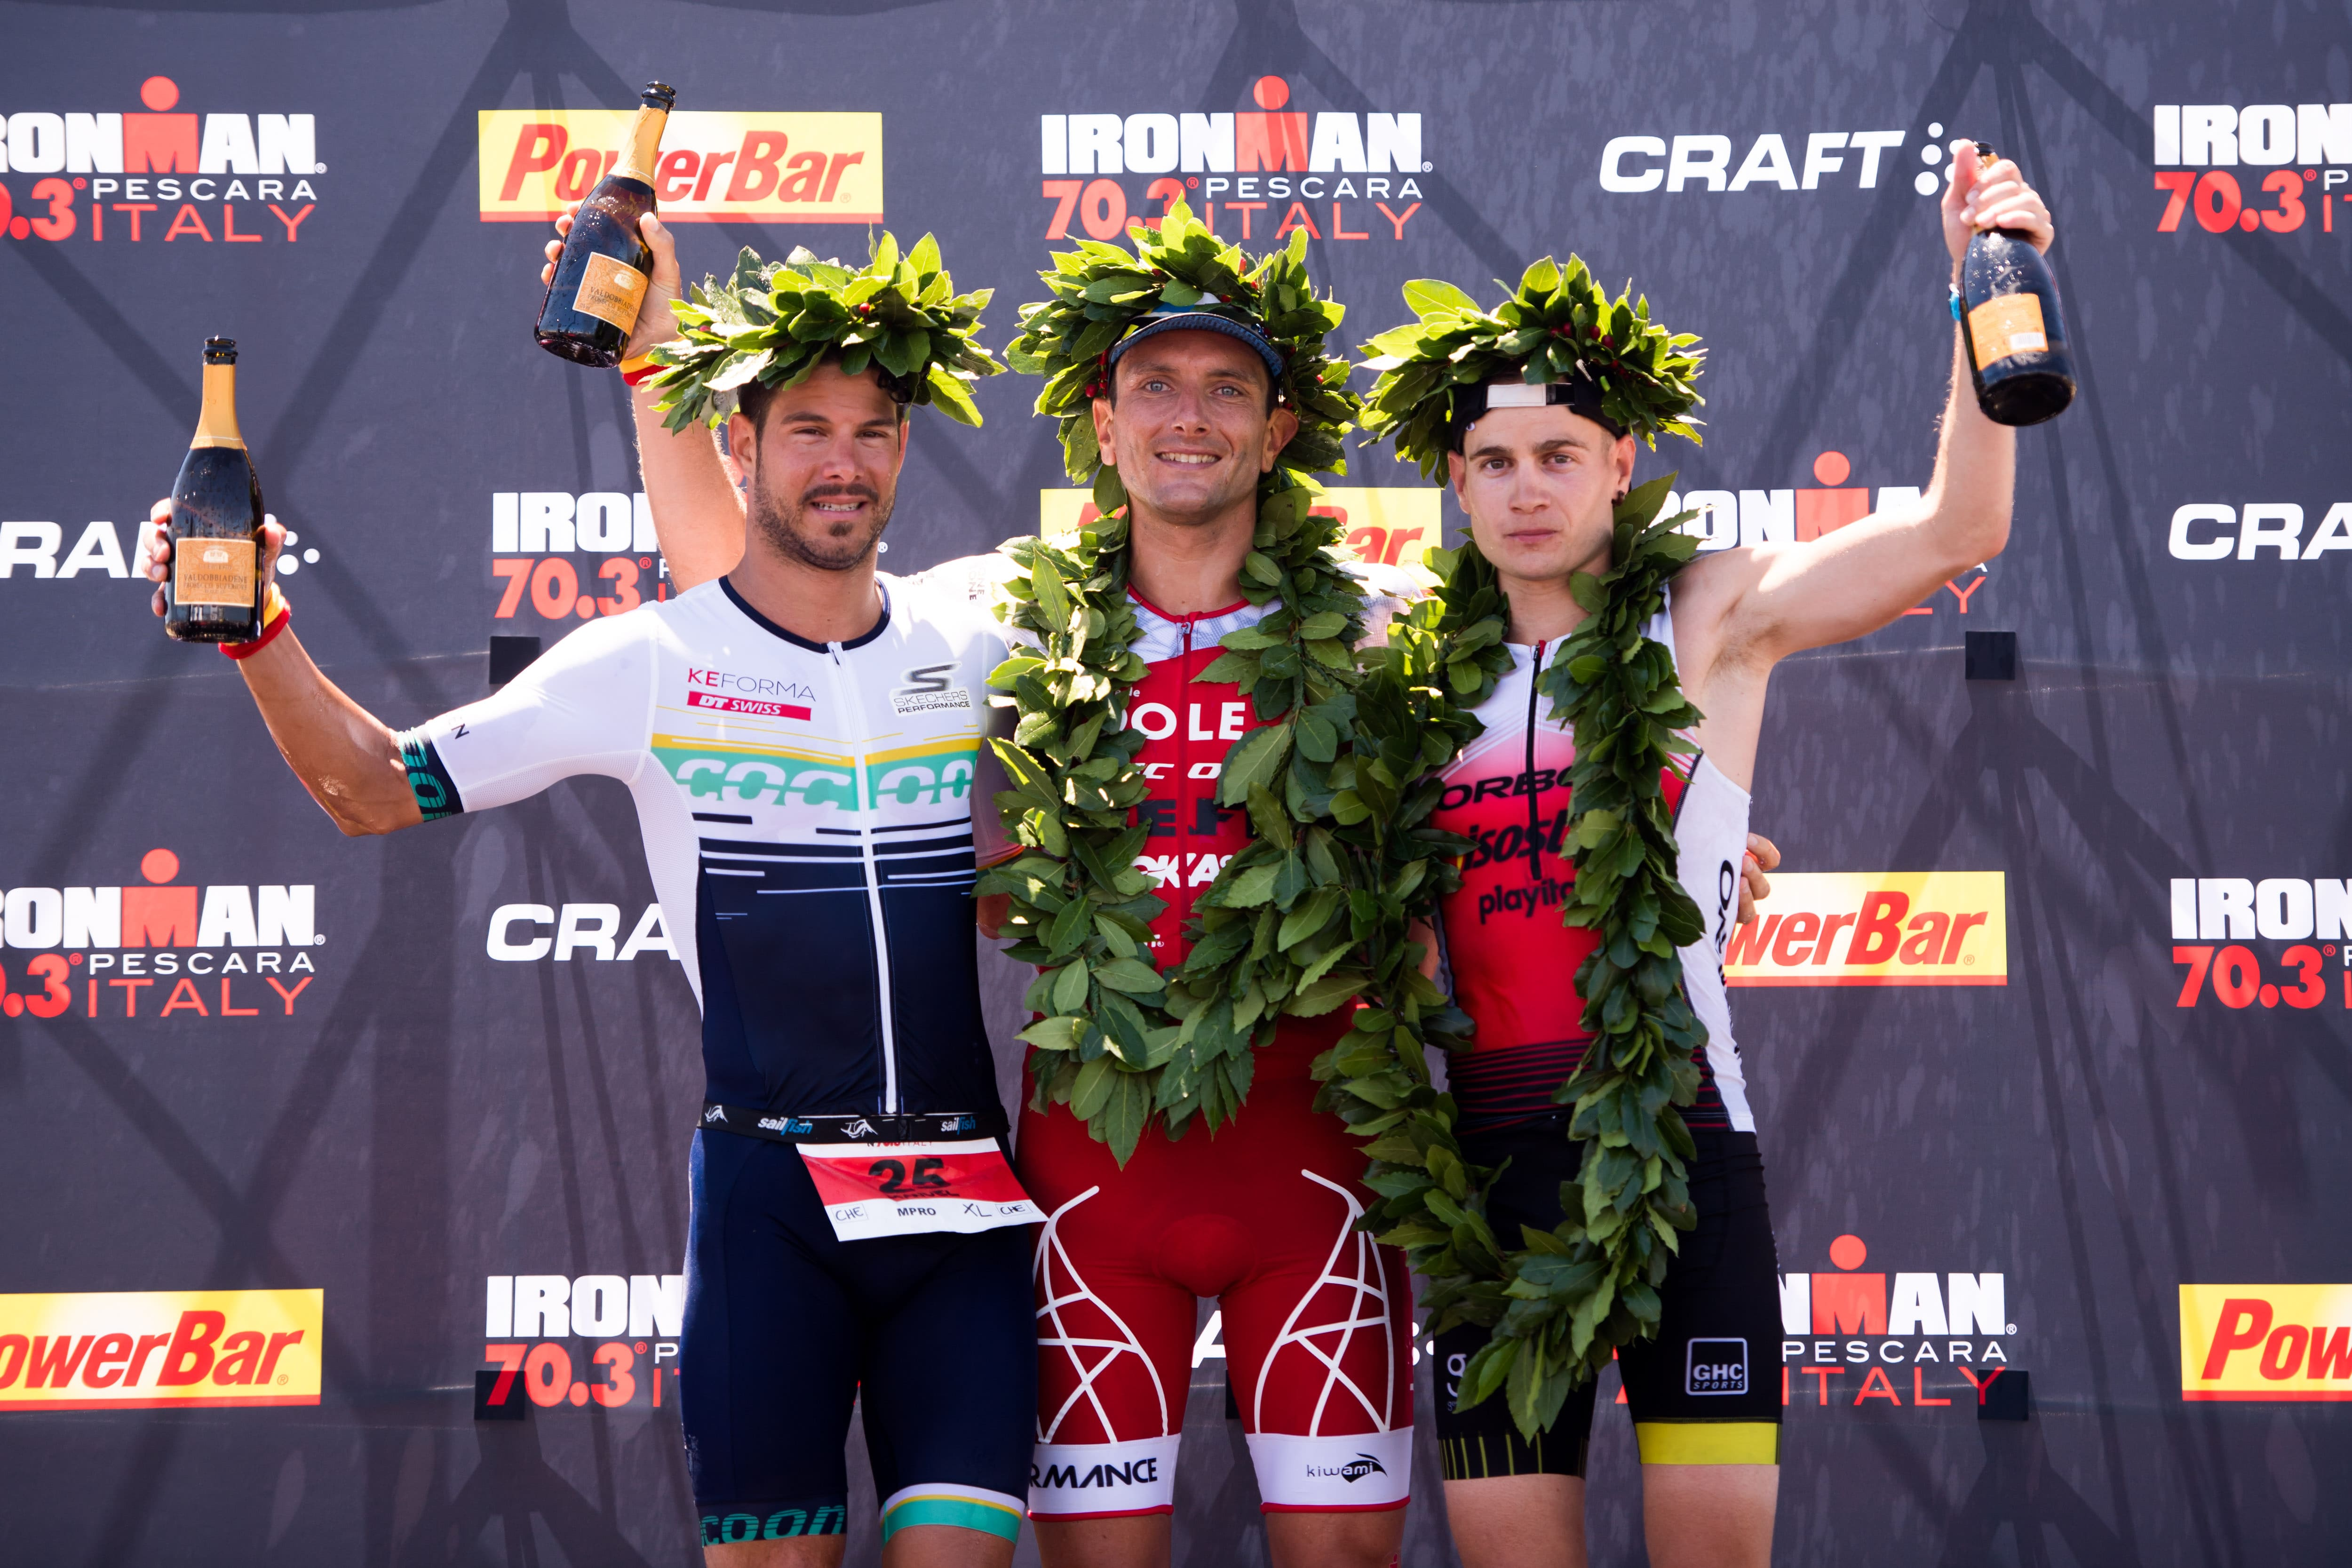 2017-06-18 Ironman 70.3 Italy